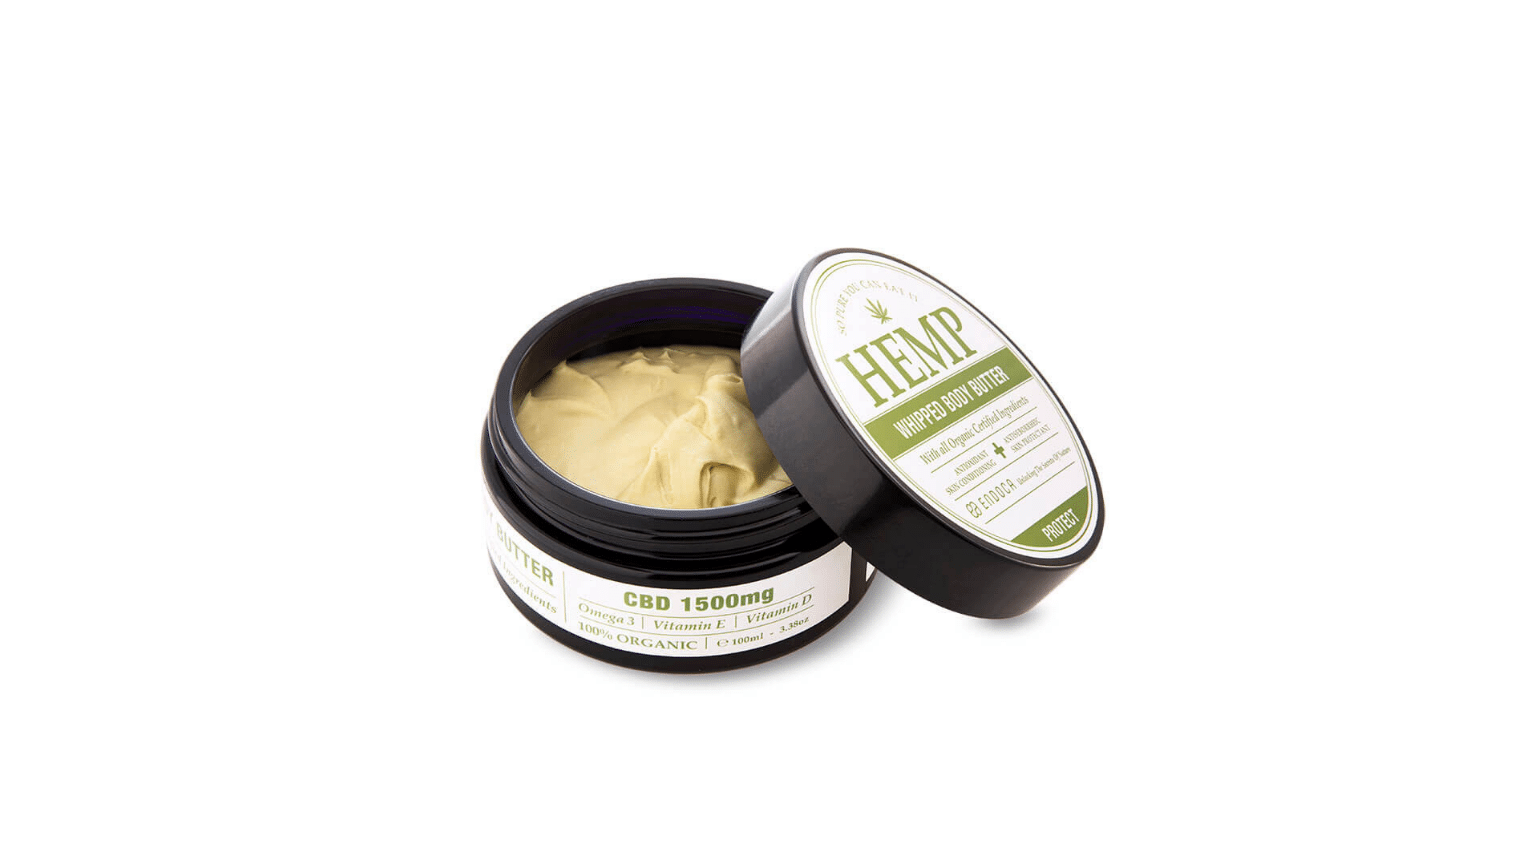 endoca-hemp-cbd-body-butter